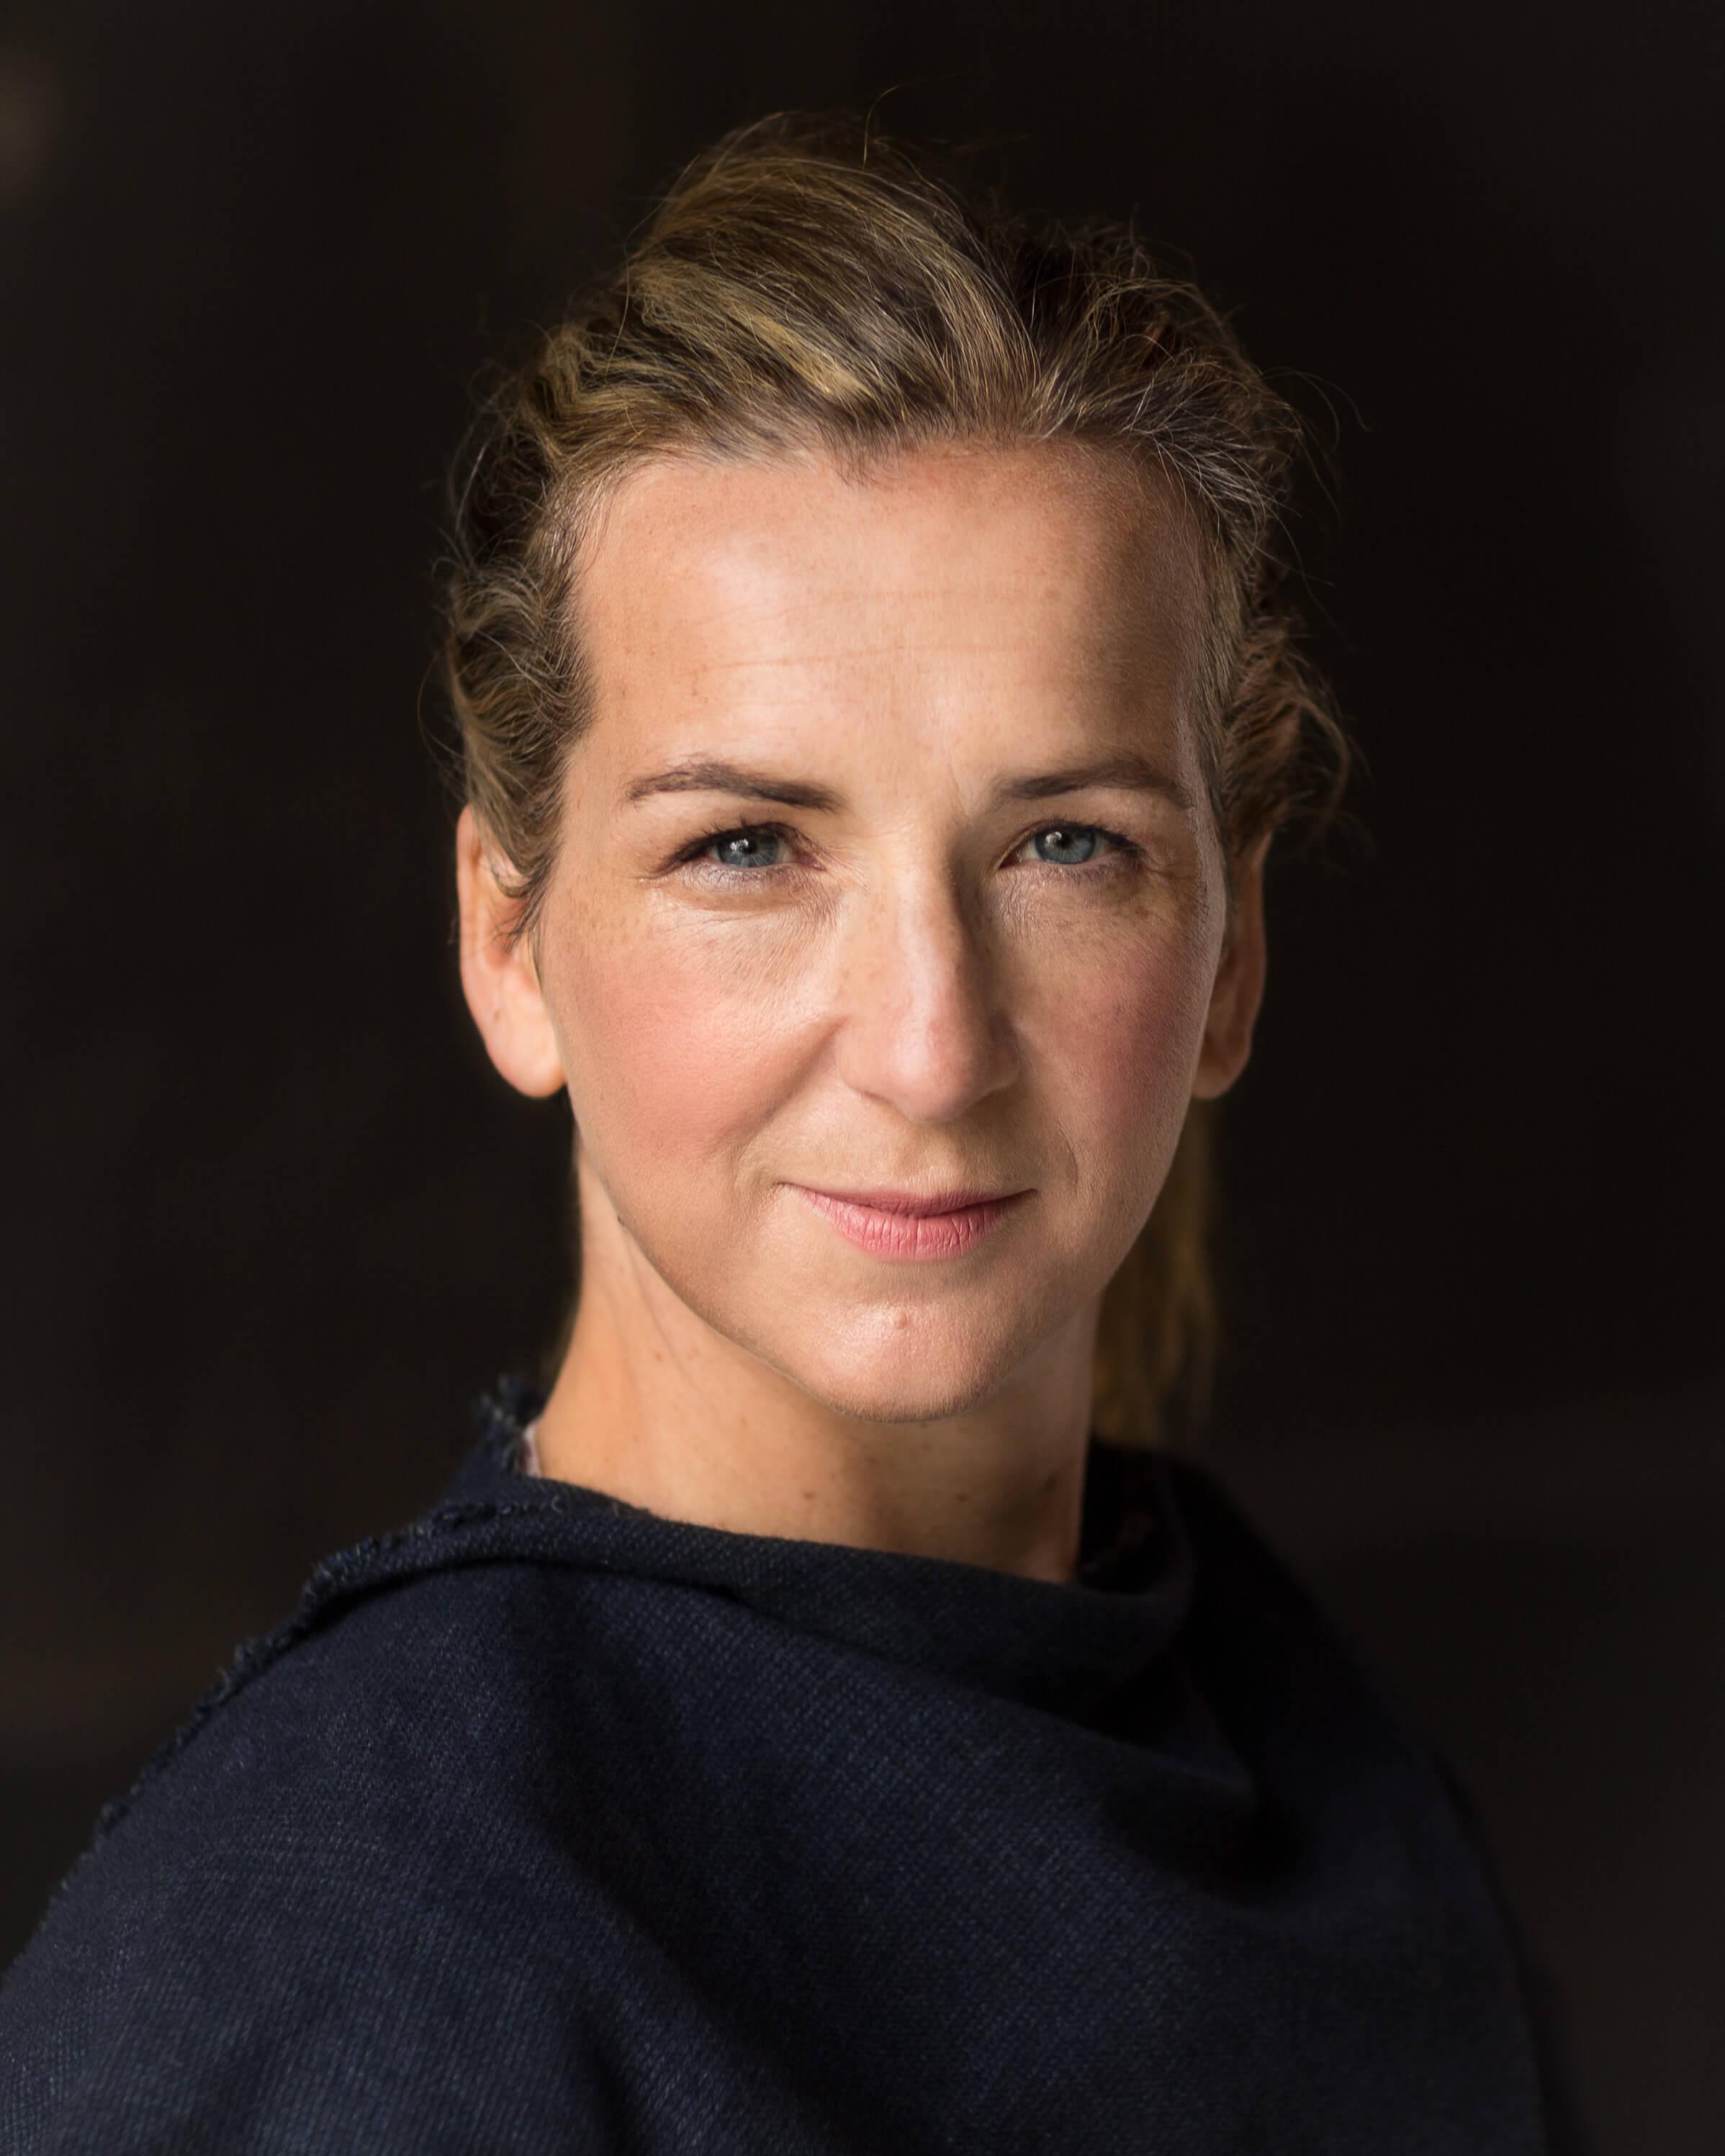 Susan Bracken, actor, 2018